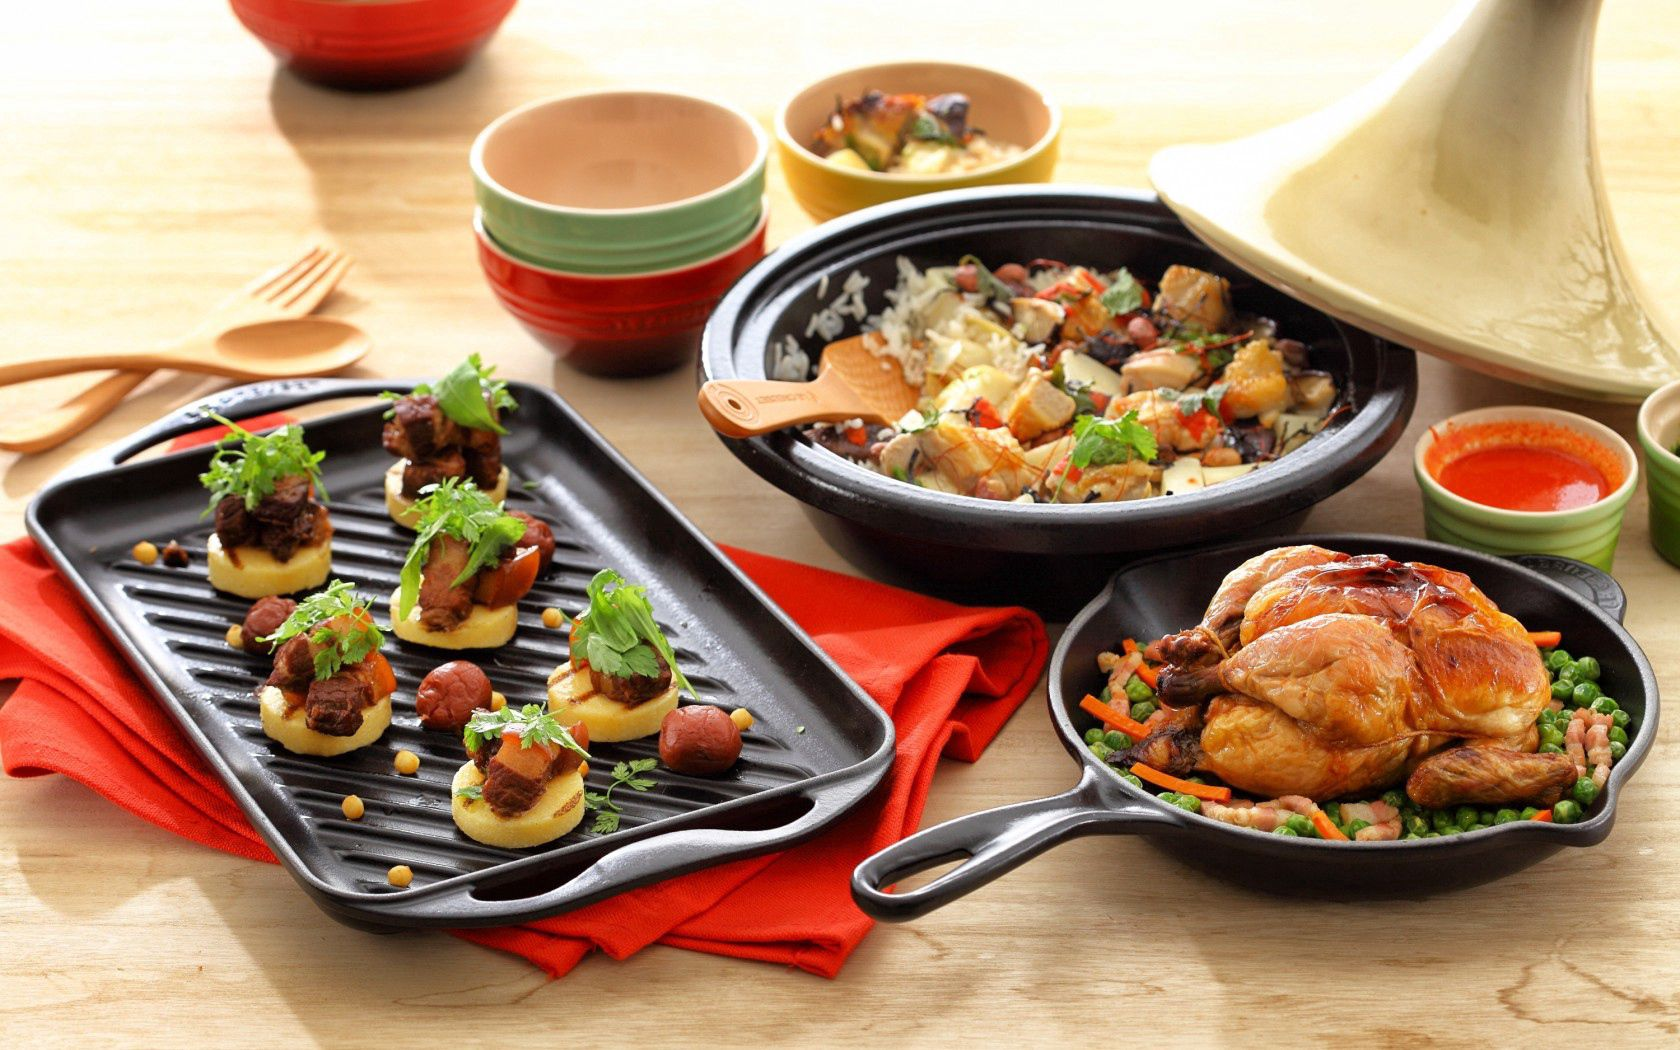 143692 скачать обои Еда, Посуда, Мясо, Курица, Жареное - заставки и картинки бесплатно